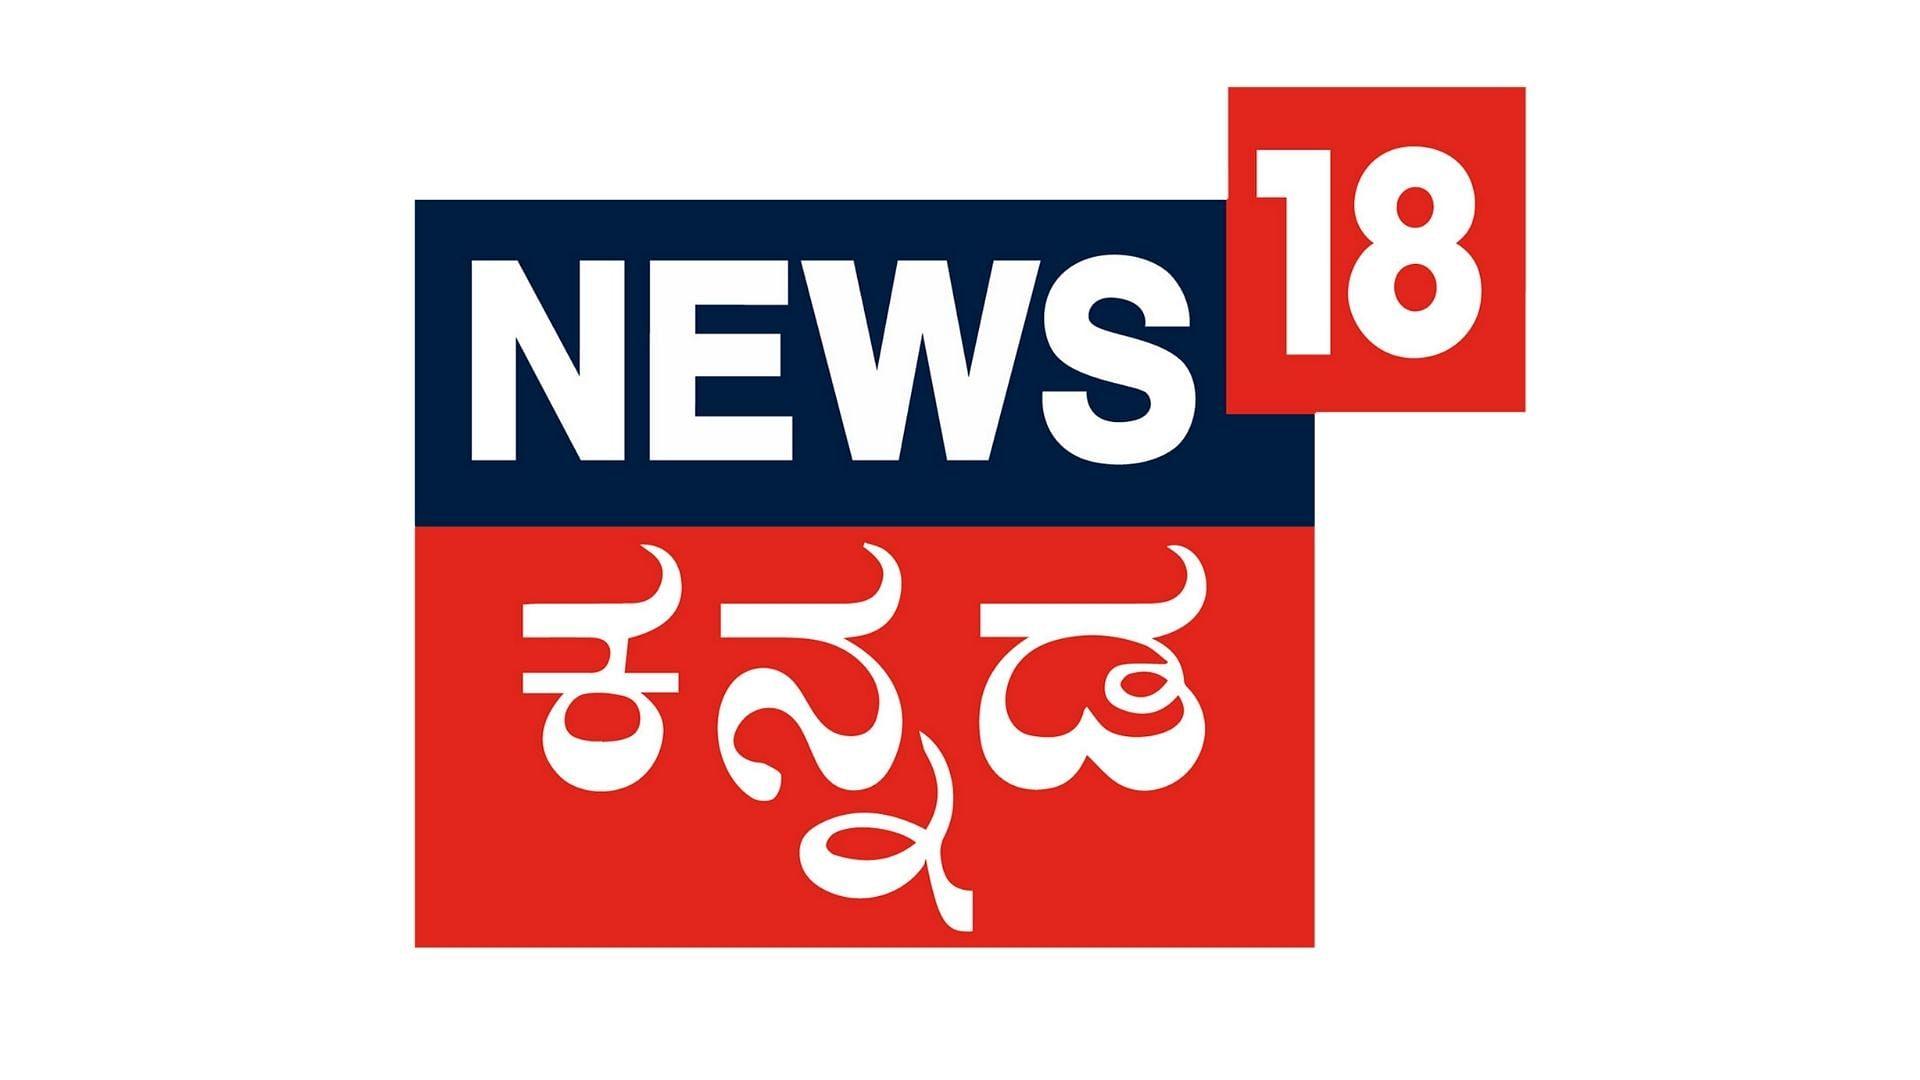 news18?blur=25